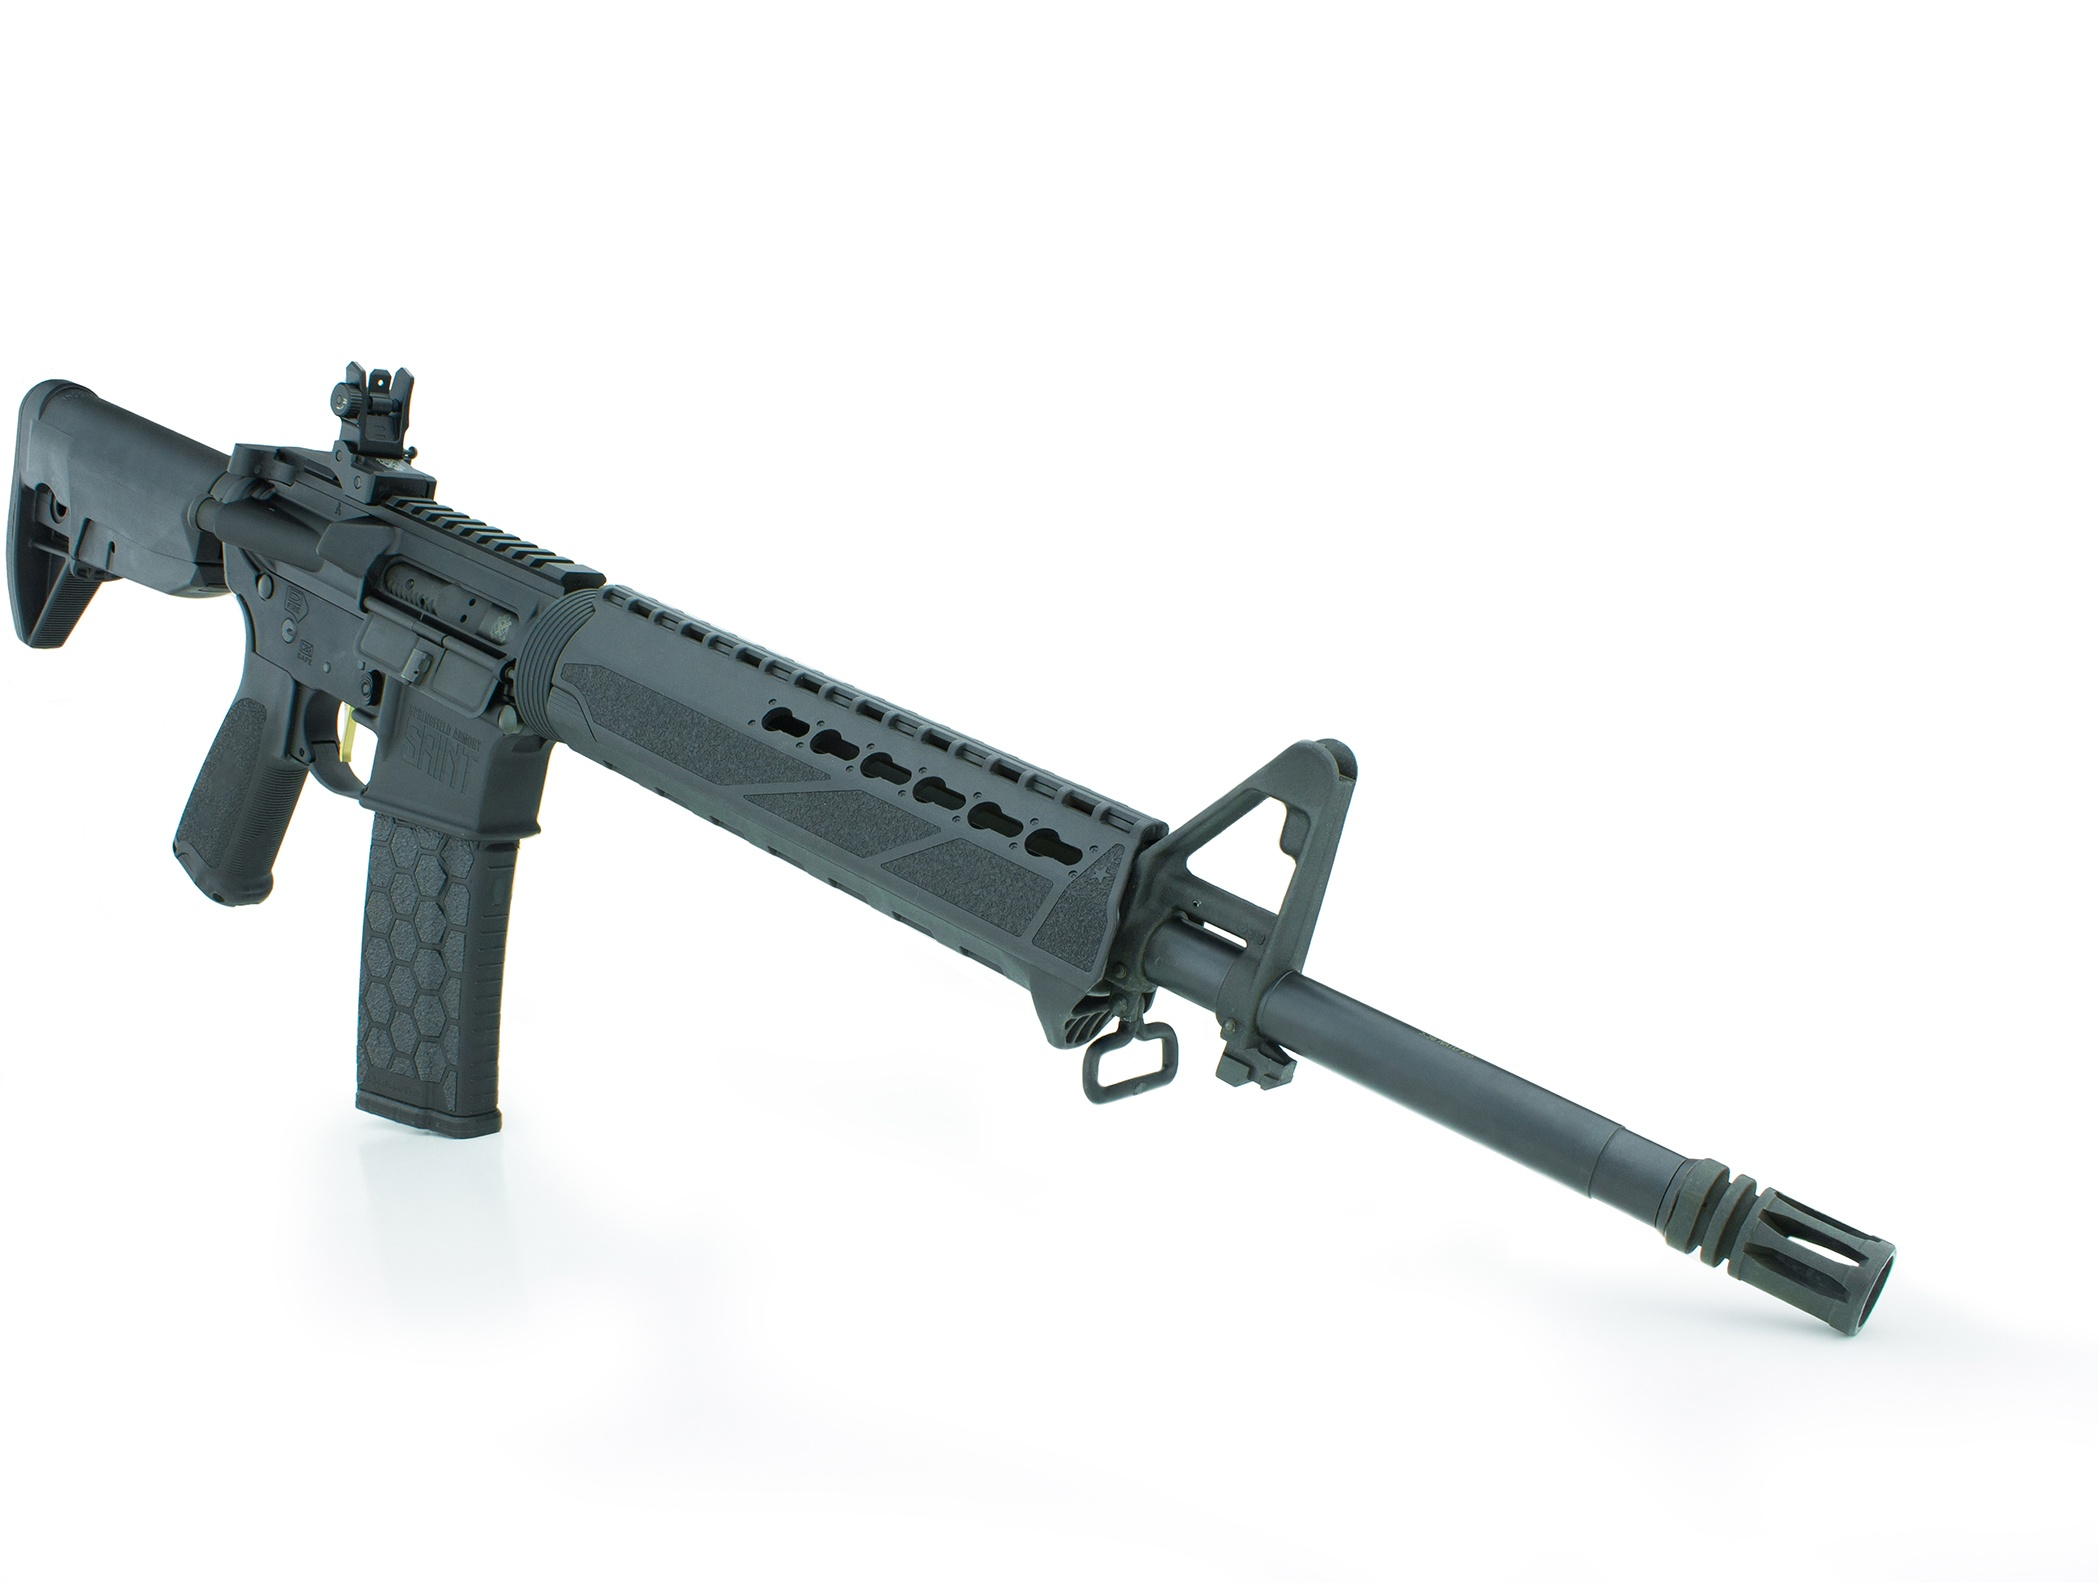 Springfield Saint AR-15 angle quartering to